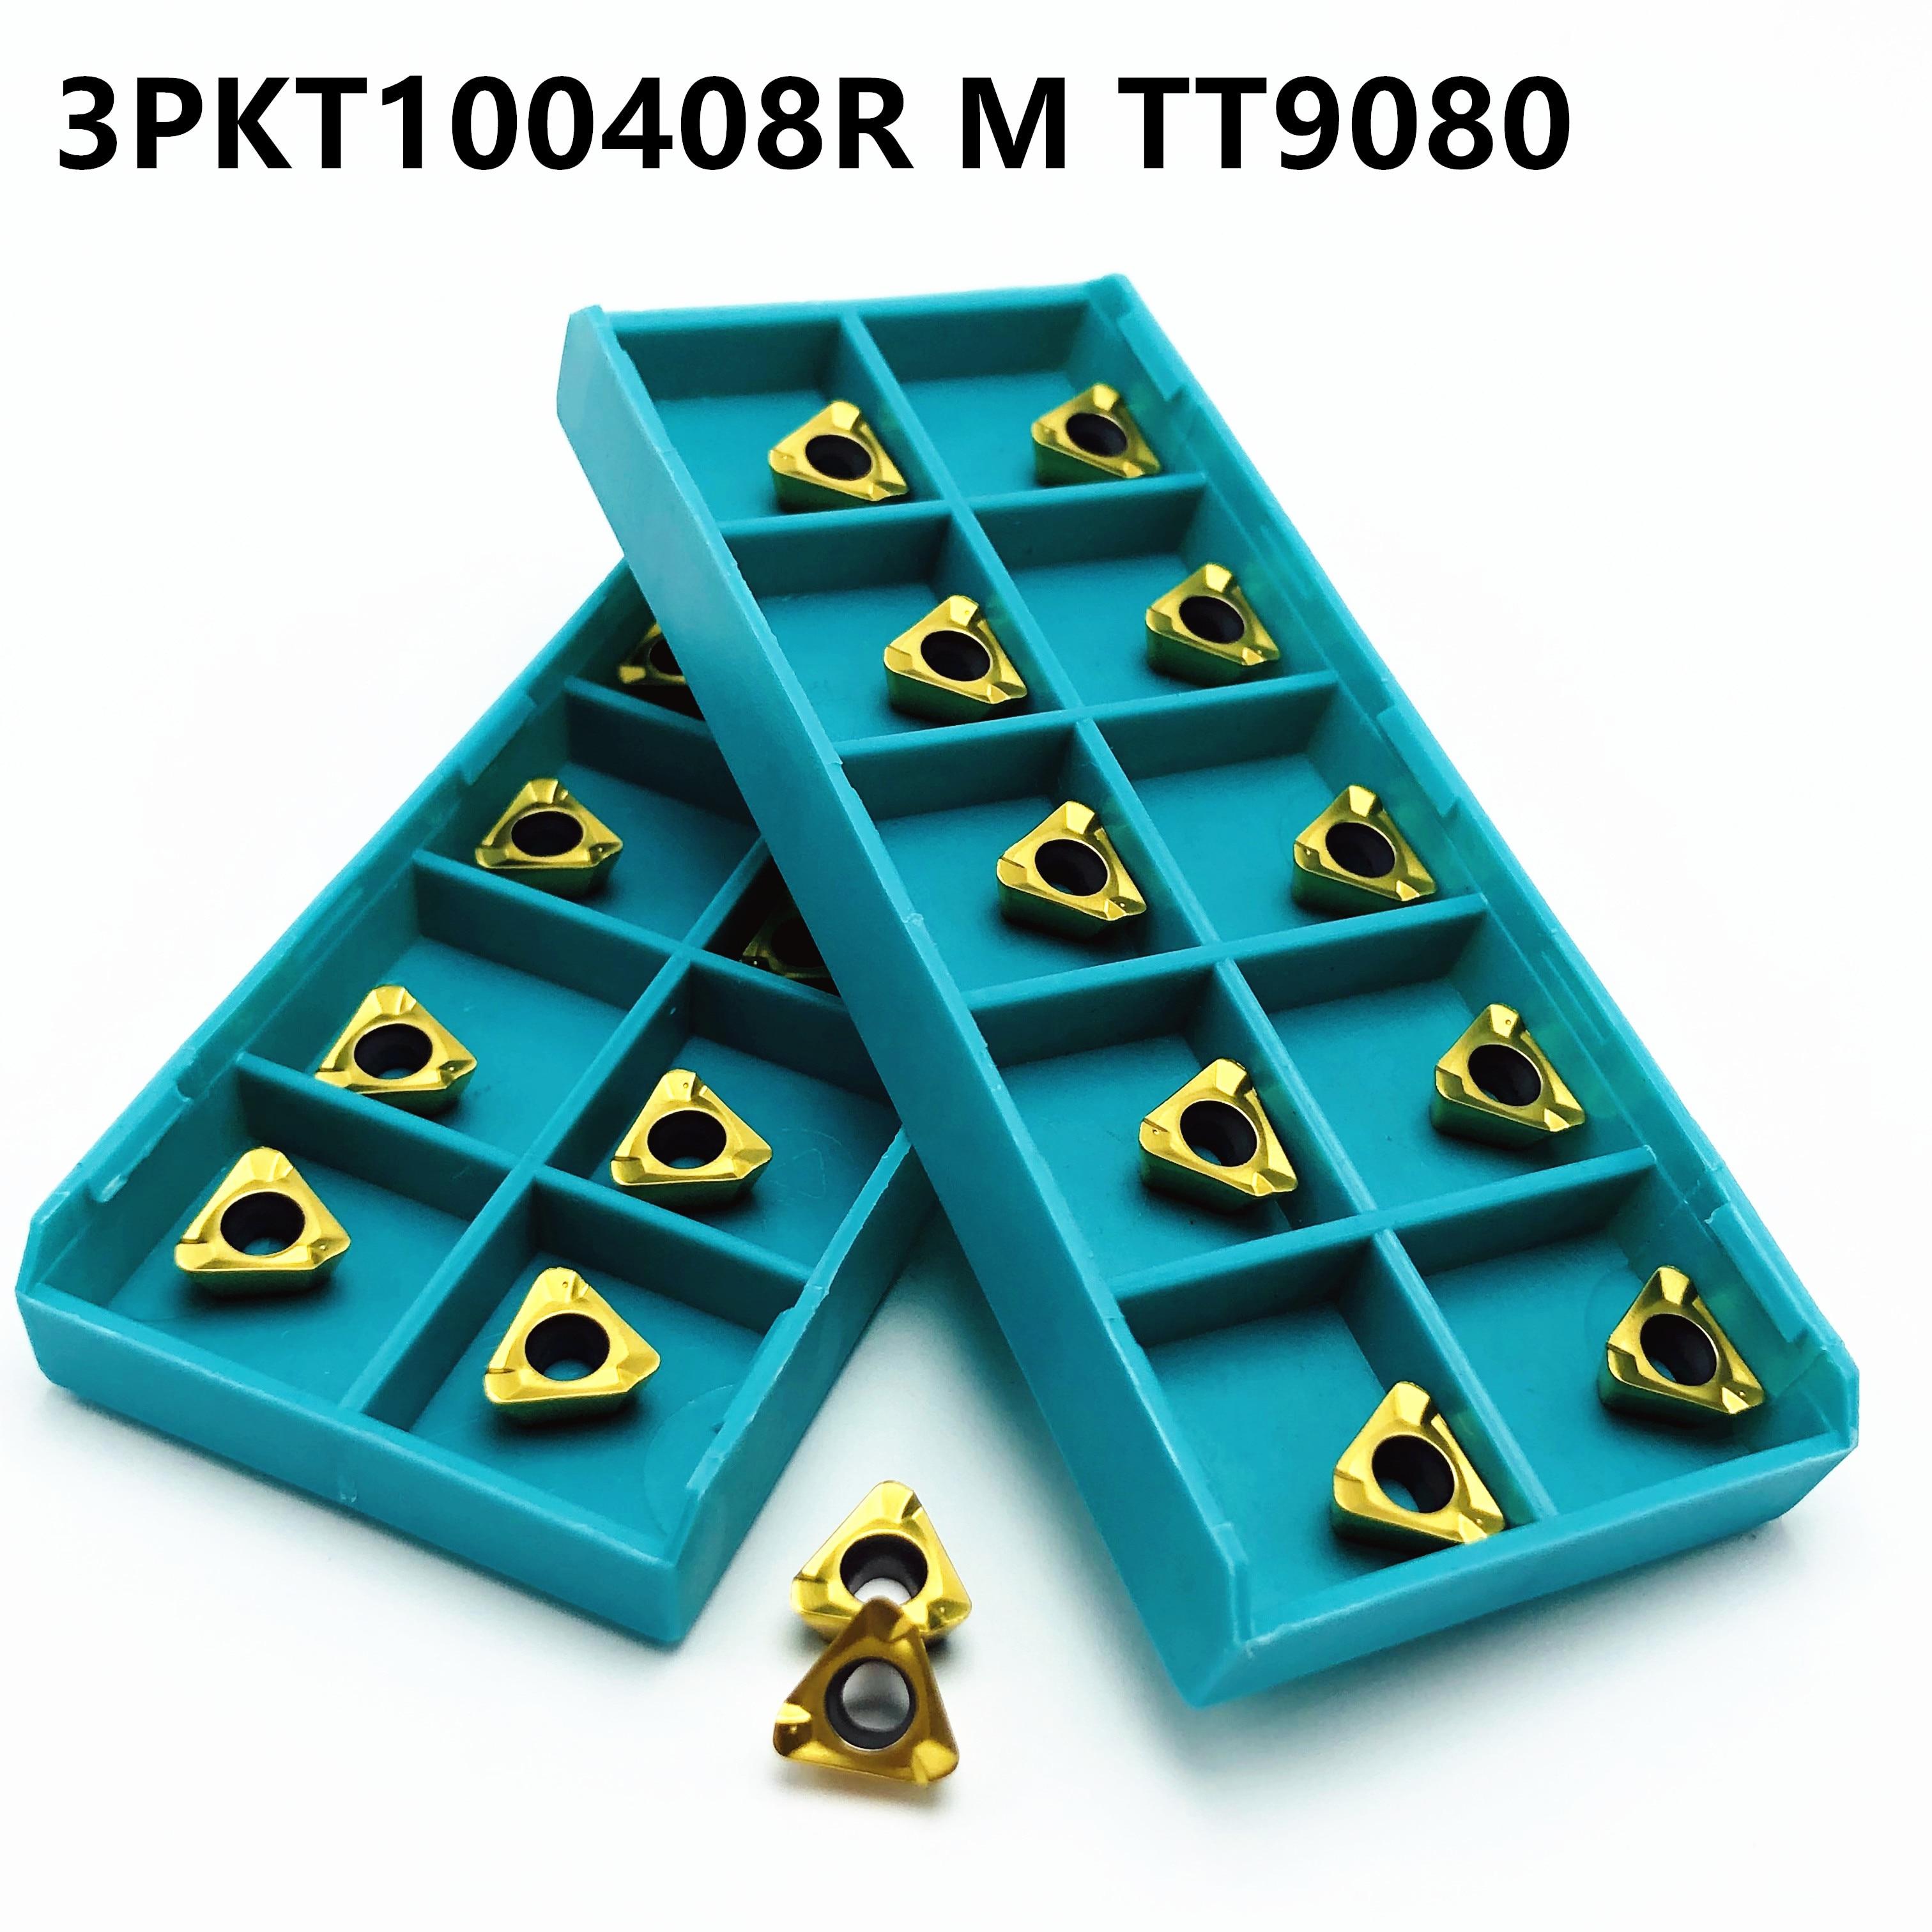 10PCS Carbide Insert 3PKT100408R M TT9080 External Turning Tool CNC Lathe Tool 3PKT 100408R CVD + PVD Milling Tool Carbide